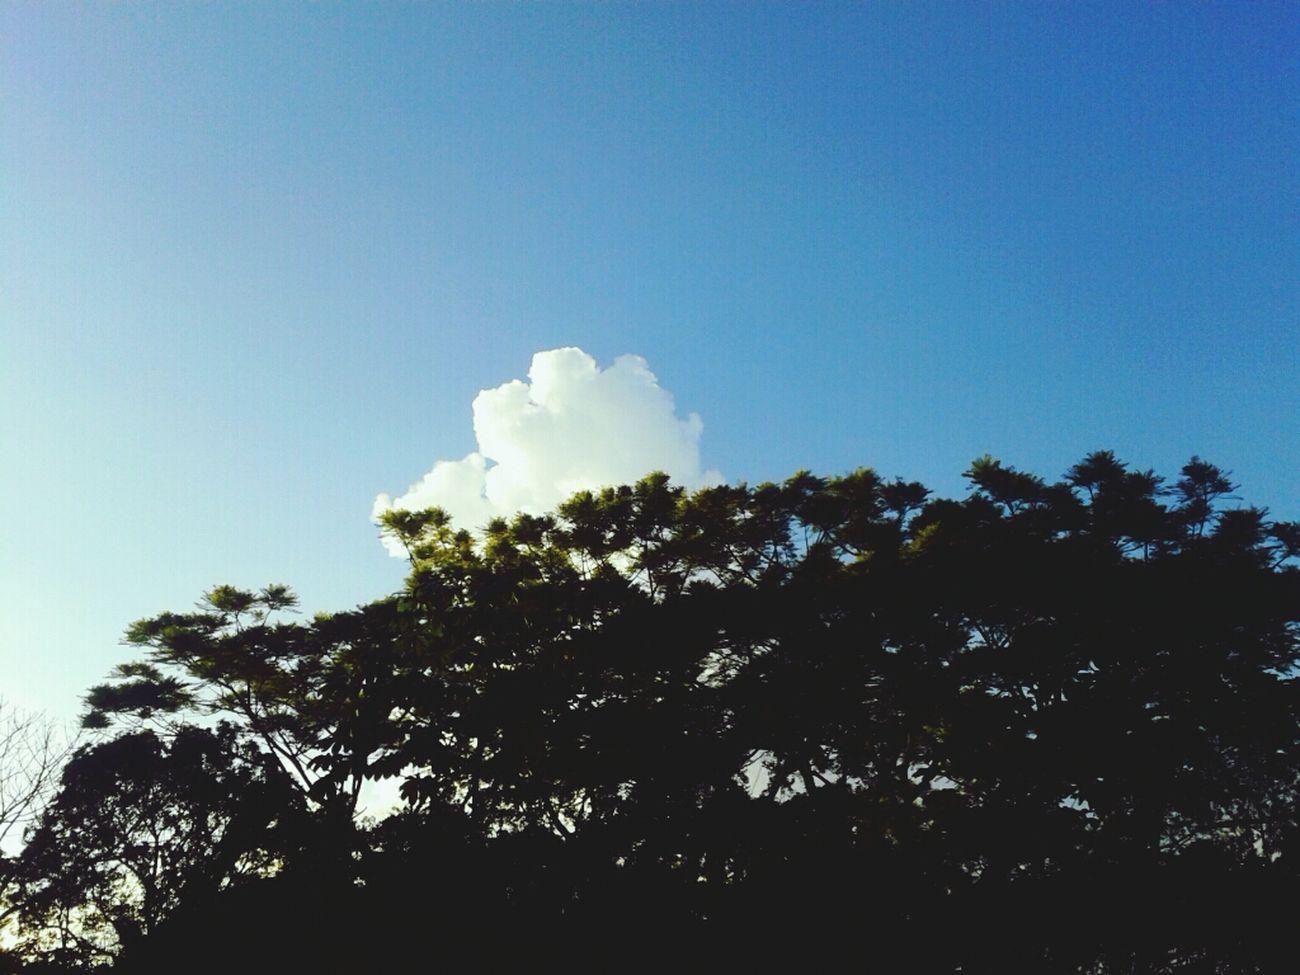 Naturelovers Clouds And Sky Skylovers Skyperfect